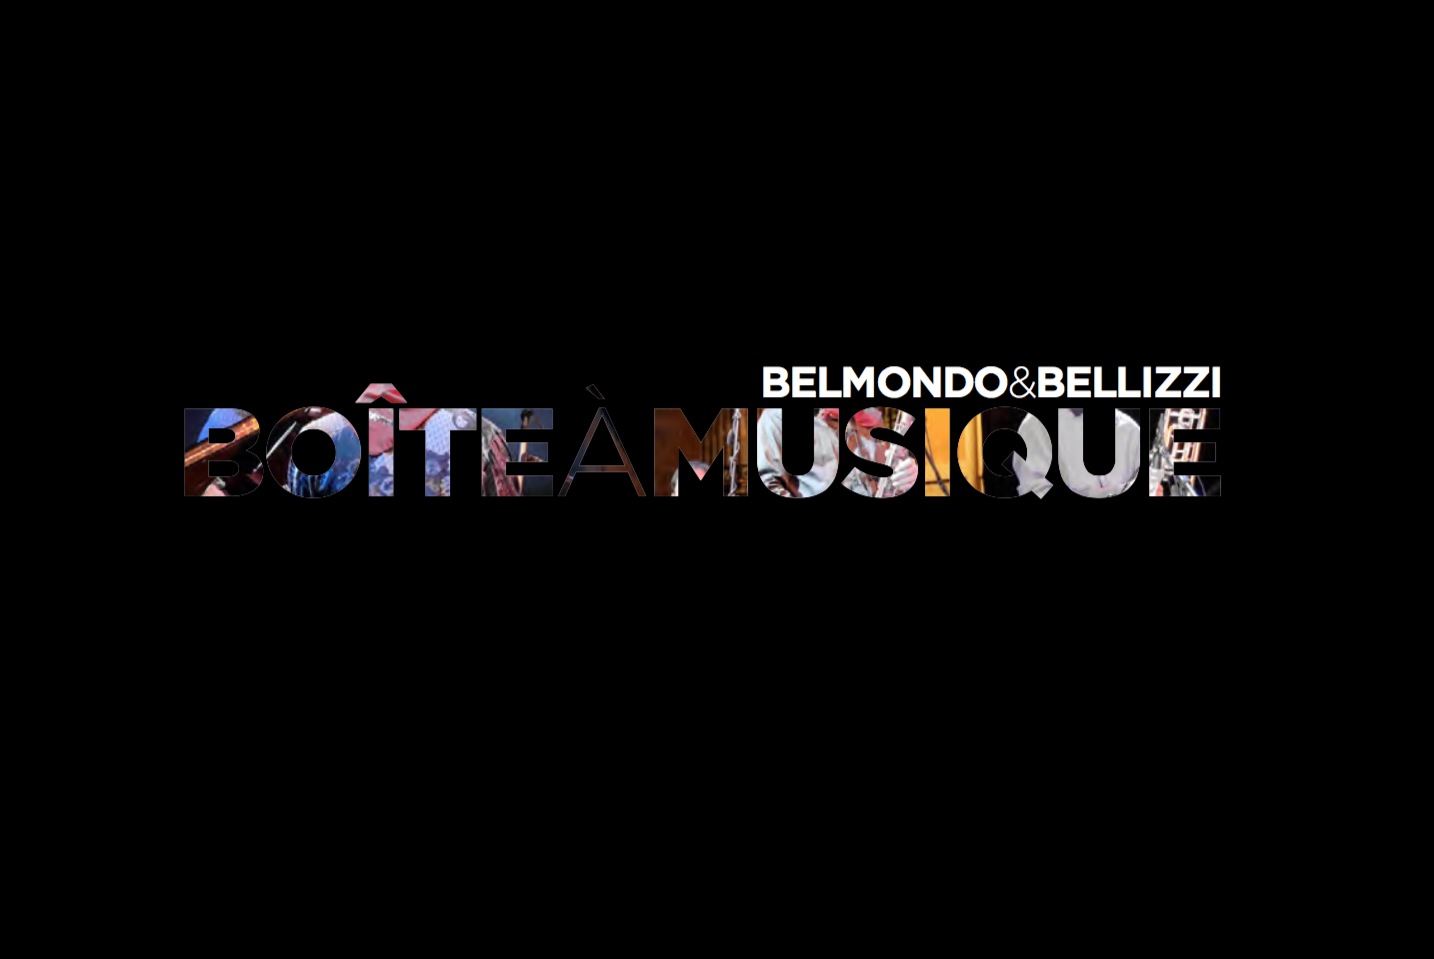 Dossier Belmondo & Bellizzi